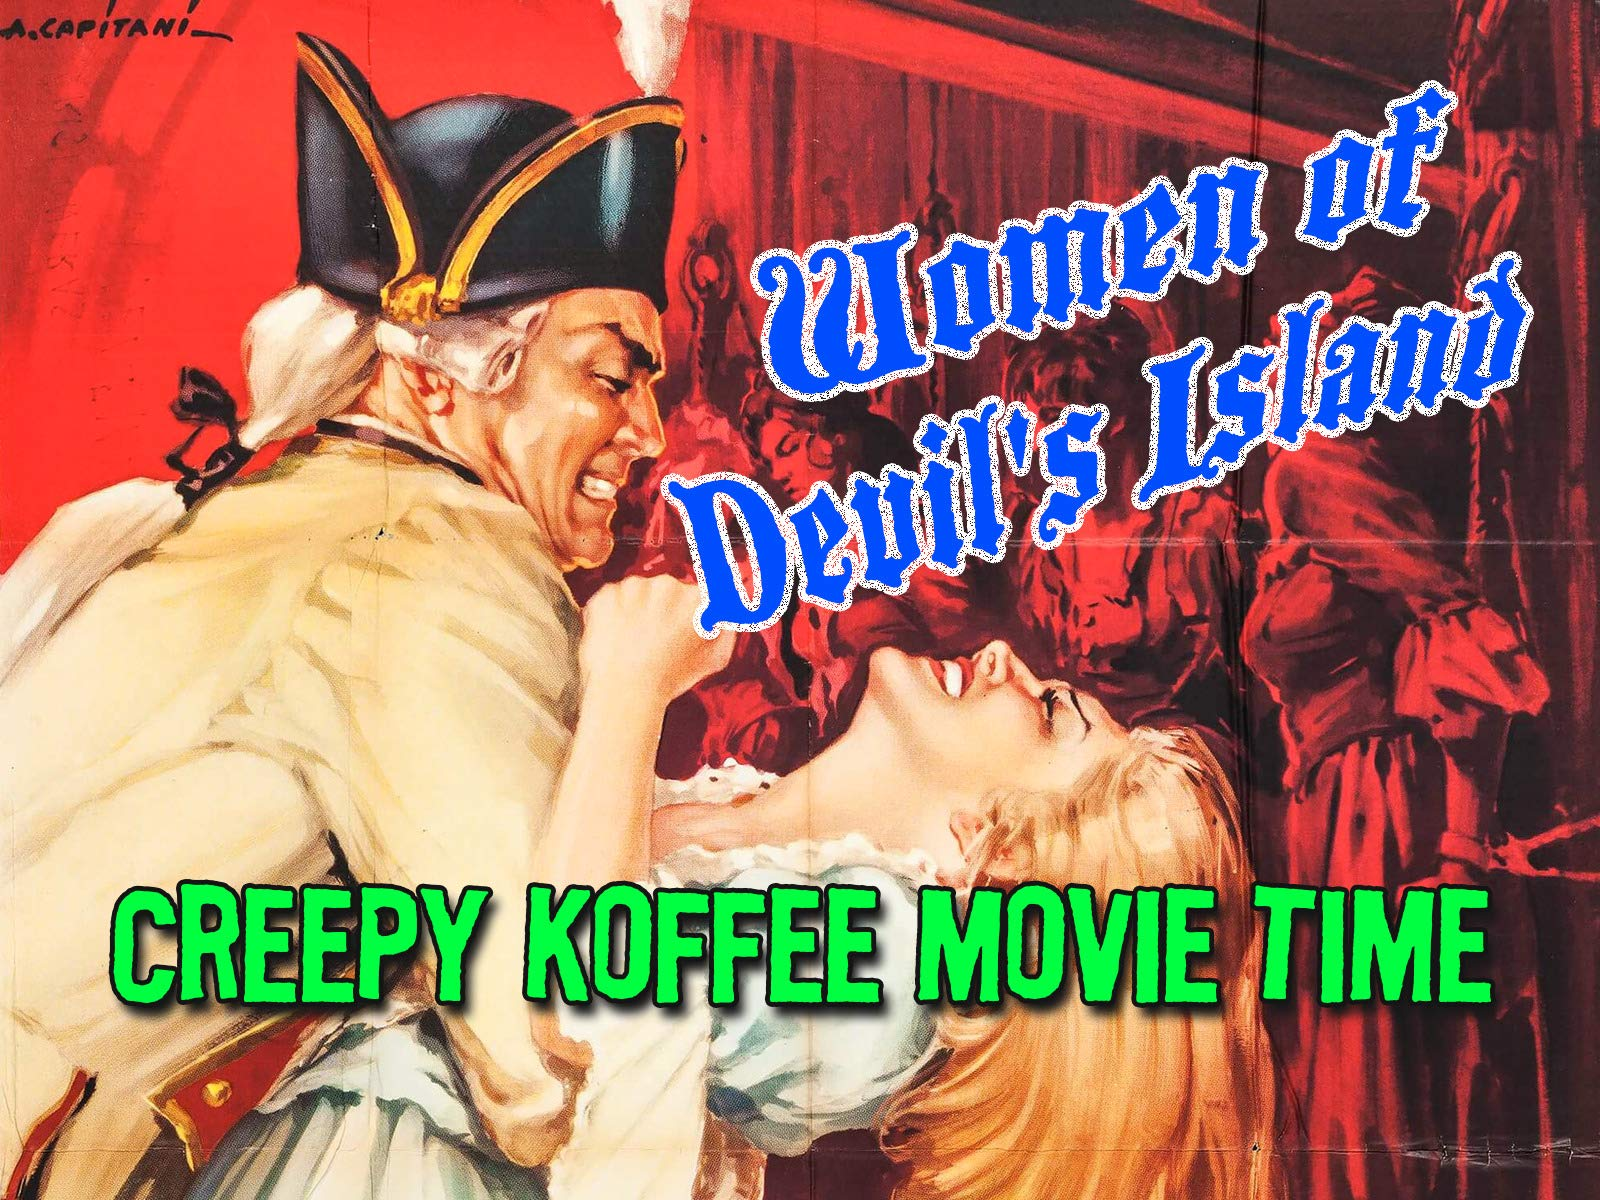 Creepy Koffee Movie Time - Season 4